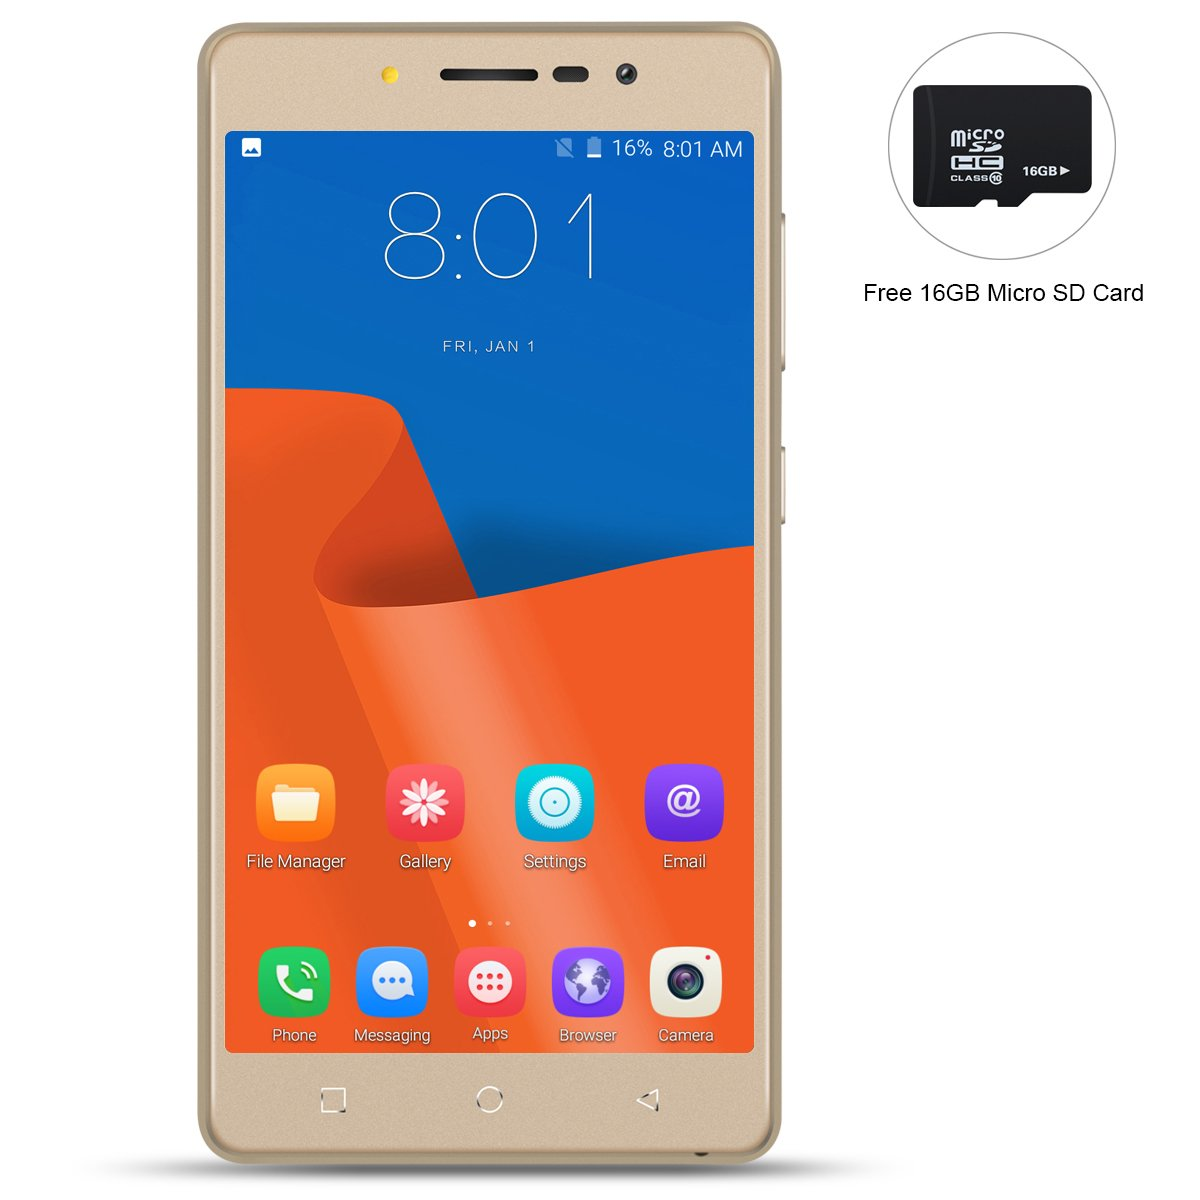 kivors 7 0 4G 5 0 Inch Android Smartphone Unlocked Quad